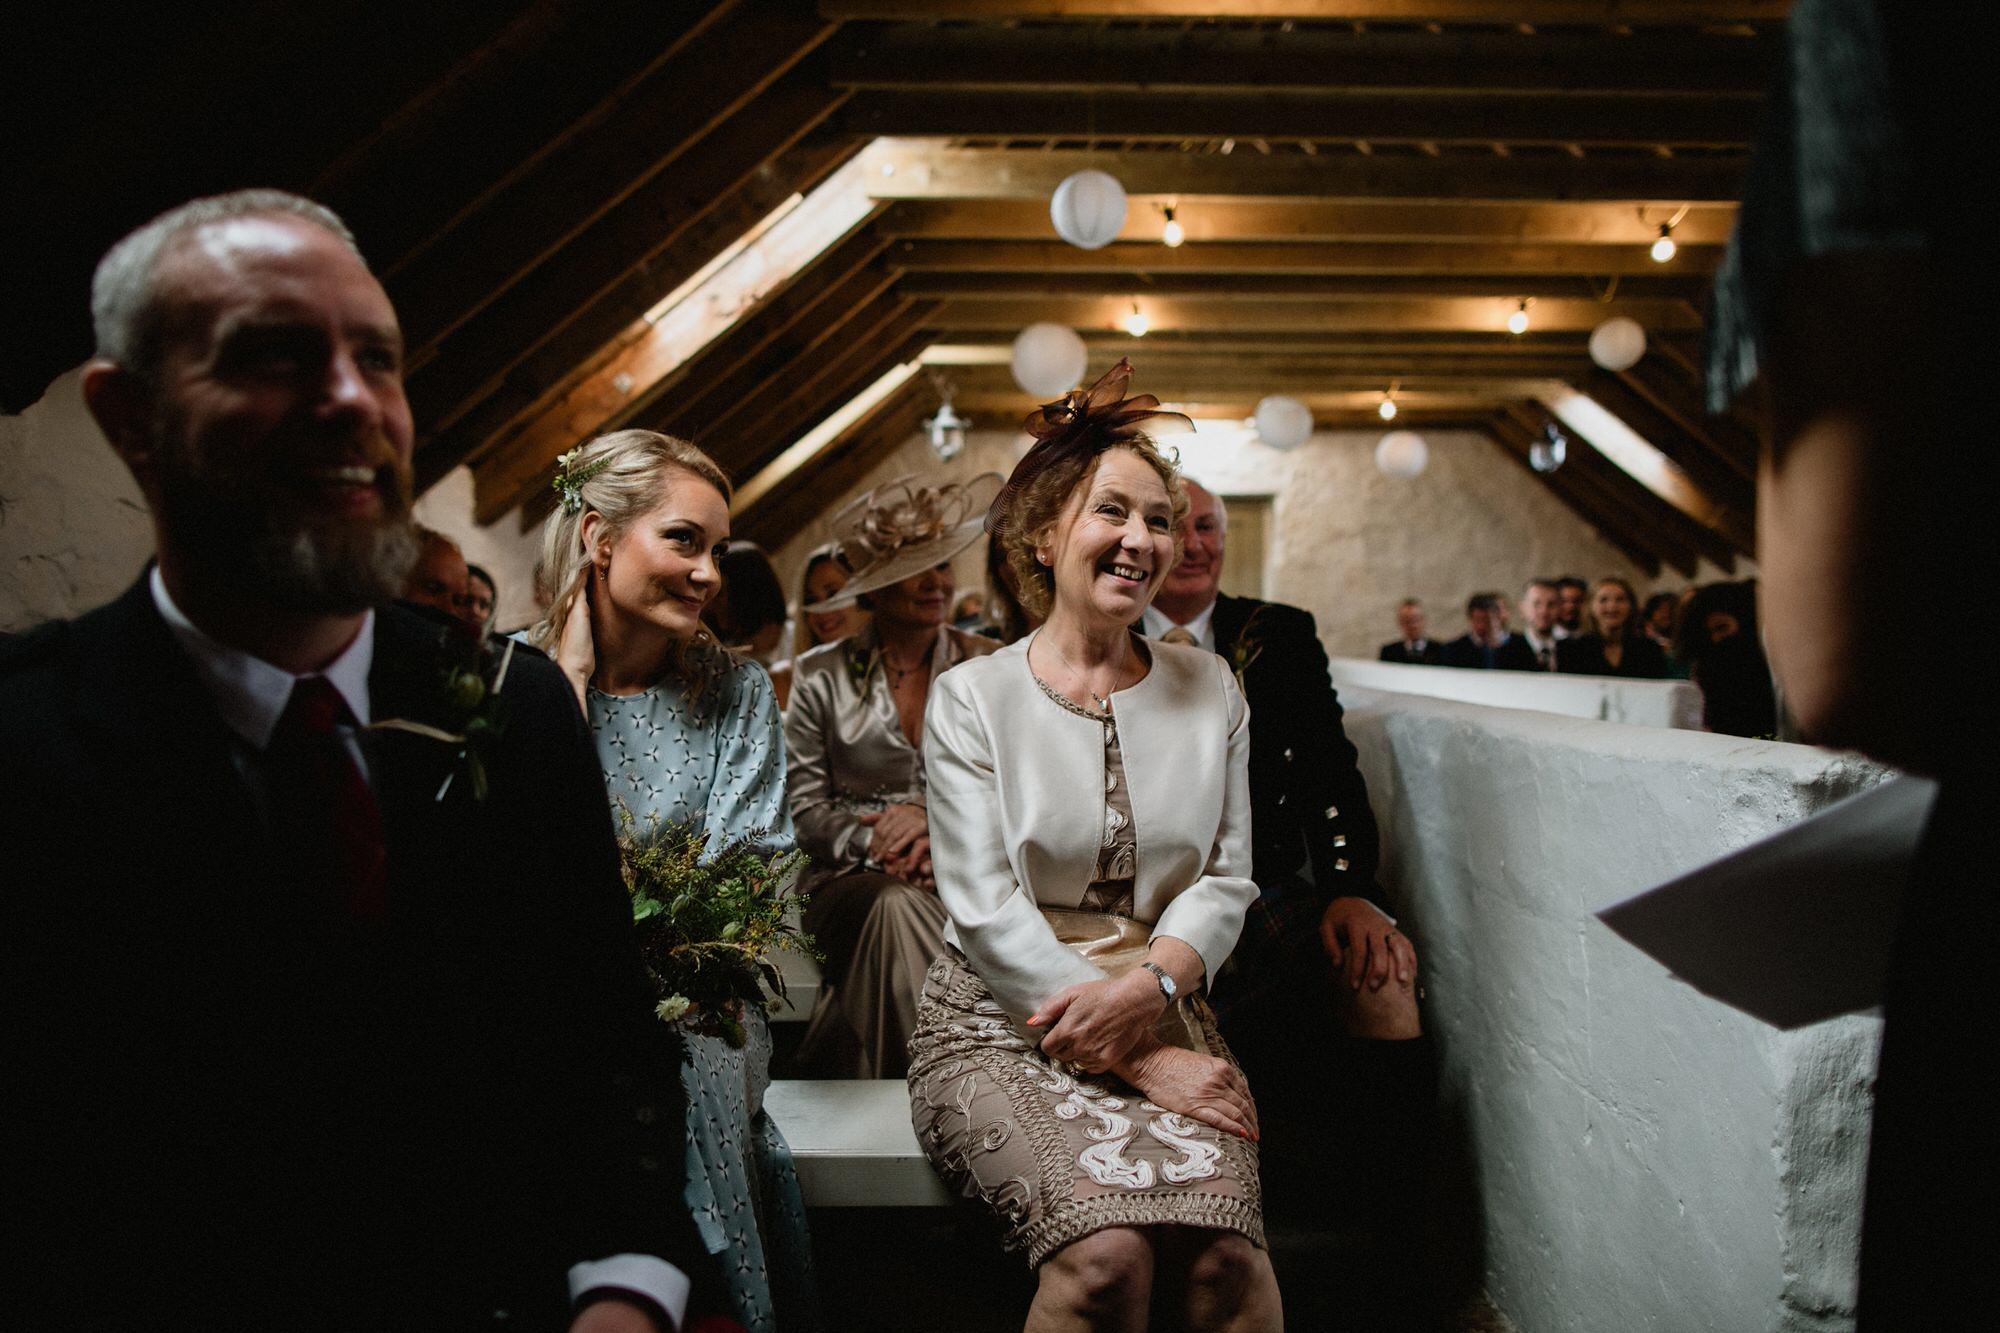 016 TIN SHED KNOCKRAICH WEDDING AUTUMN ZOE ALEXANDRA PHOTOGRAPHY